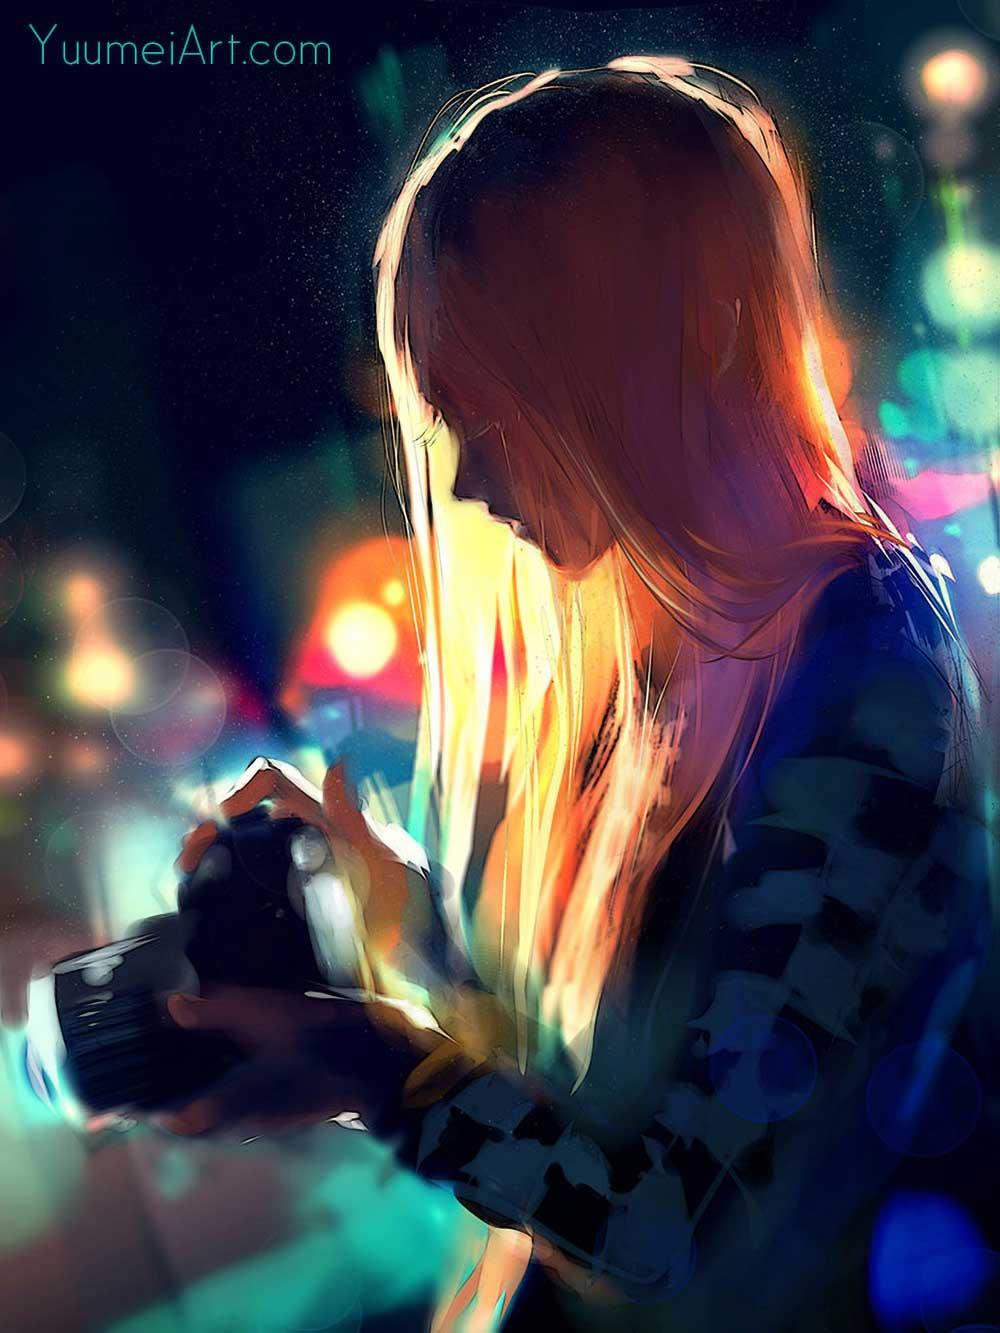 Inspirational Art : Alone Among the Lights by Wenqing Yan [Yuumei]